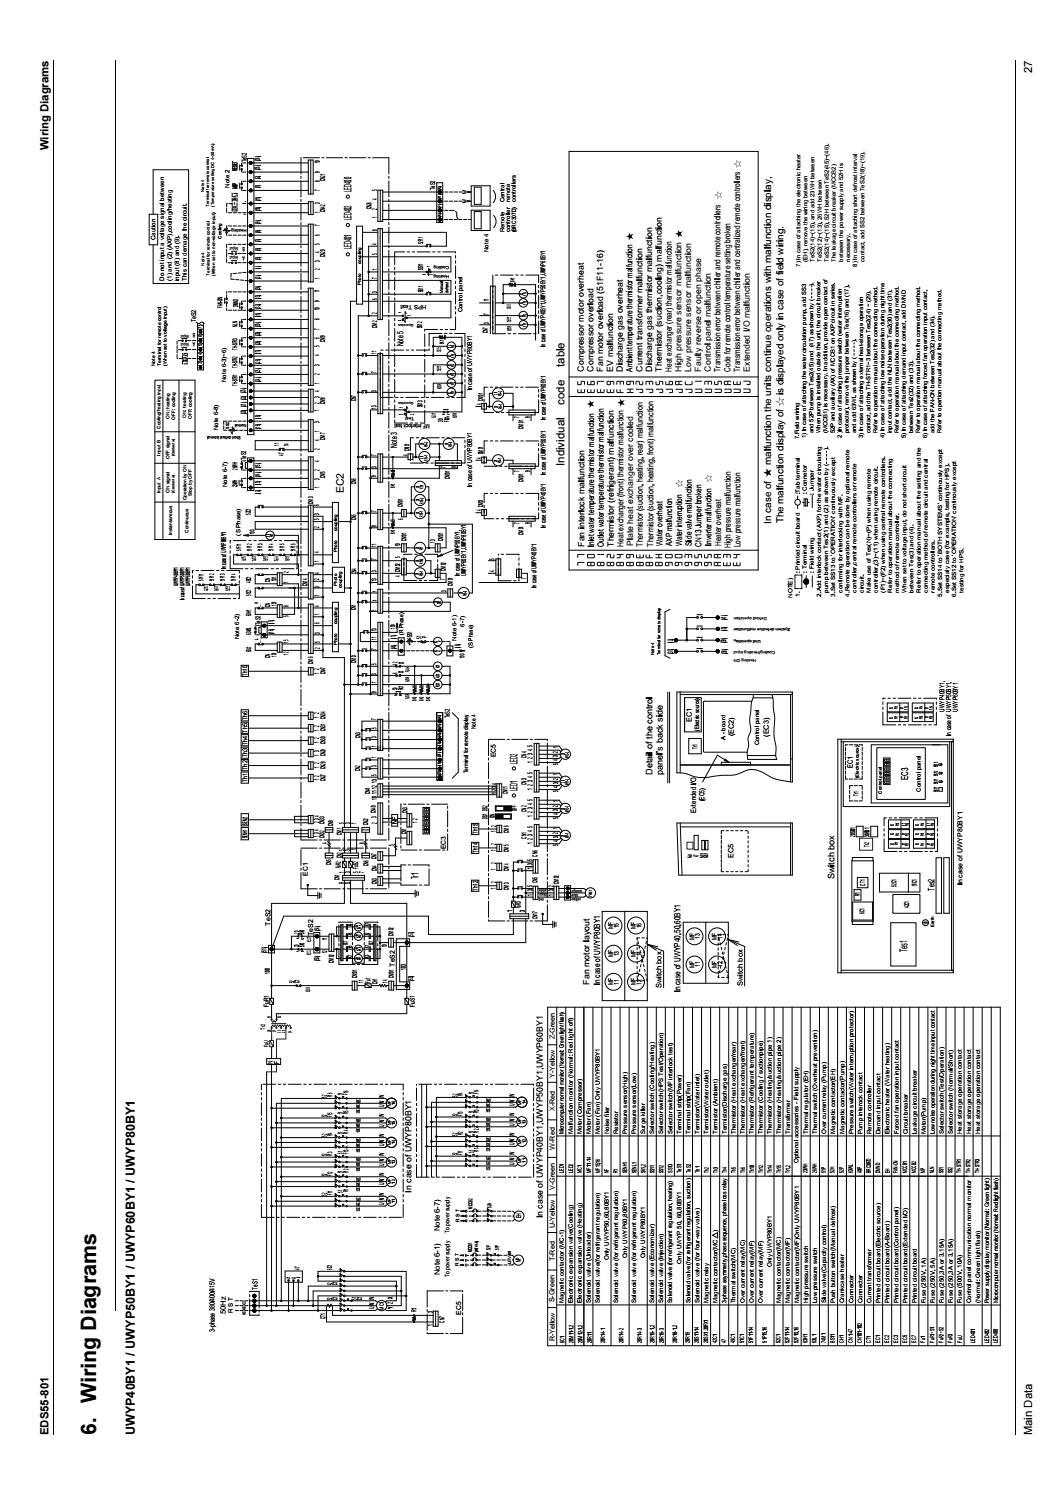 Amazing Starcraft 2409 Wiring Diagram Festooning - Electrical ...